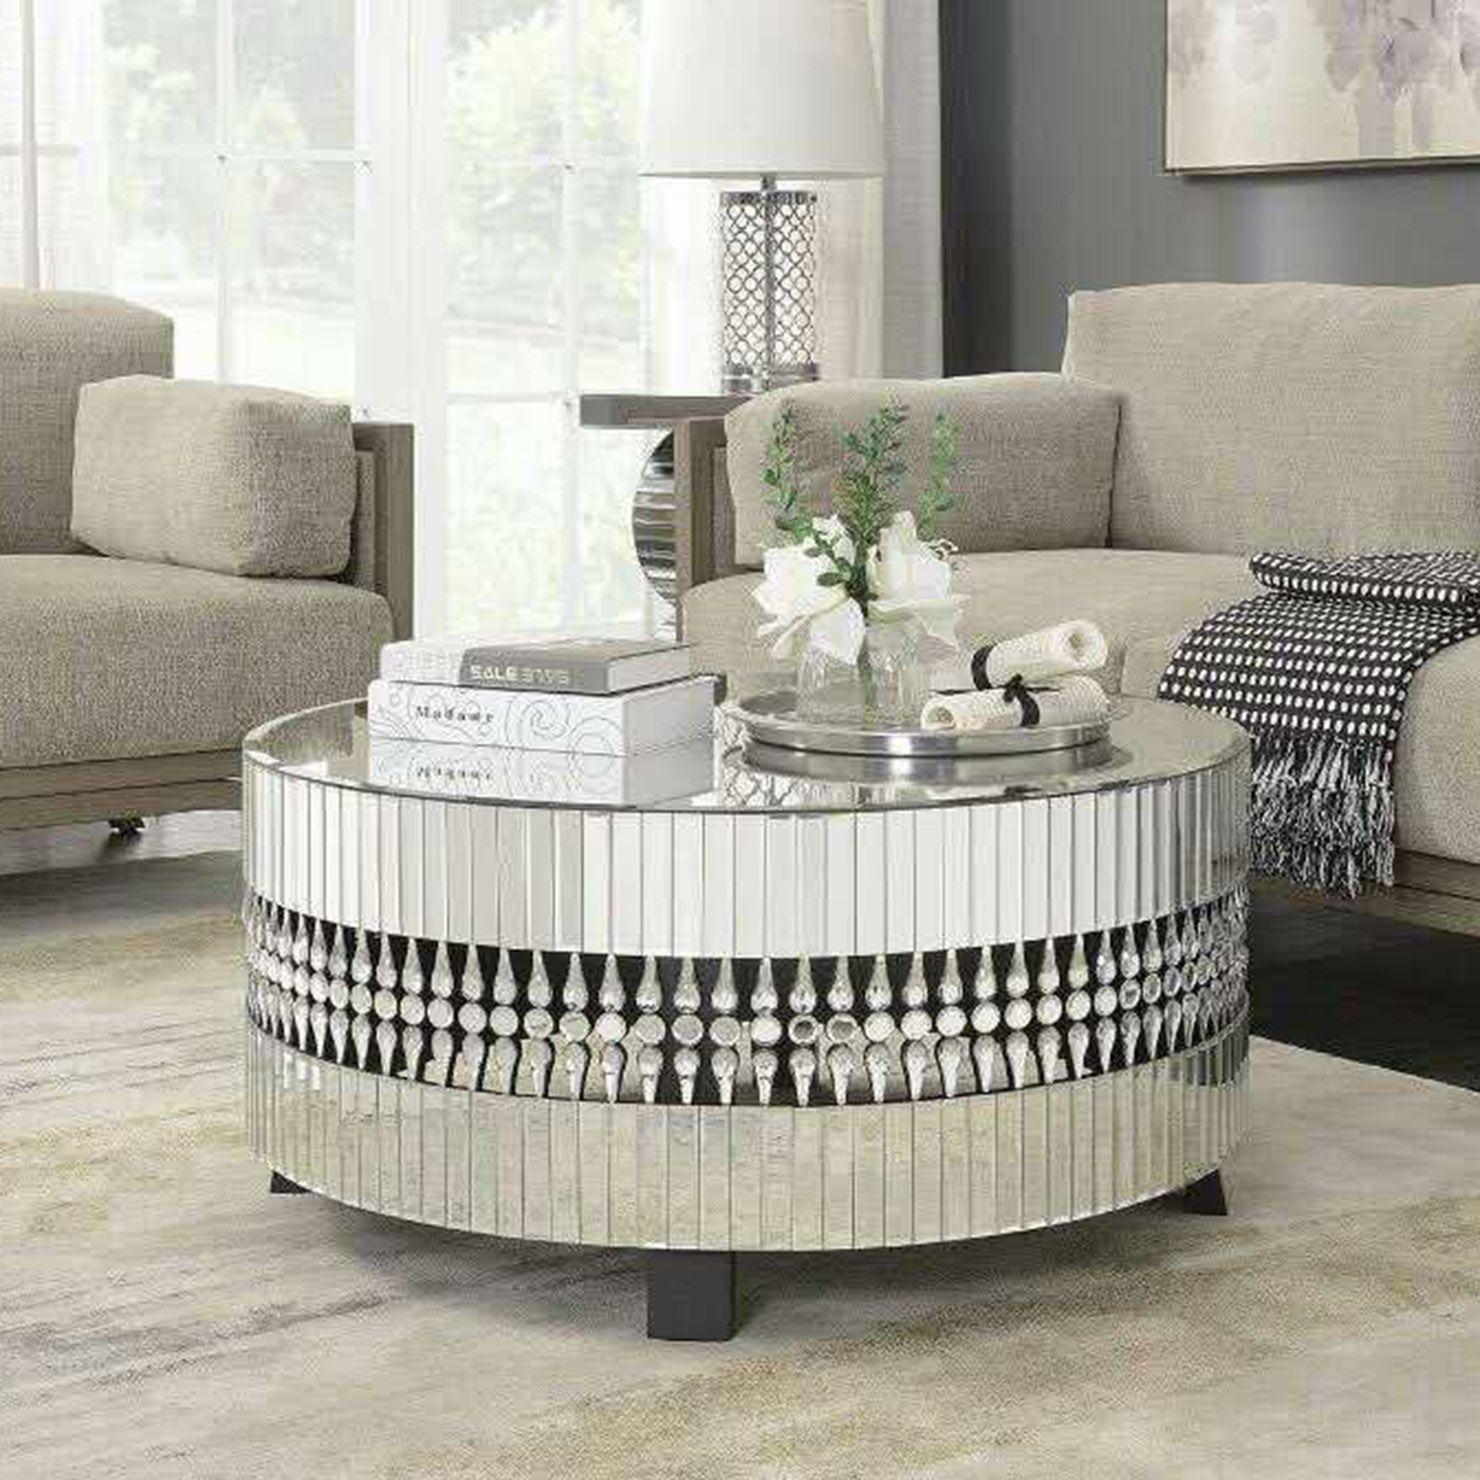 Crystal Coffee Table, Mirror Mirrored furniture